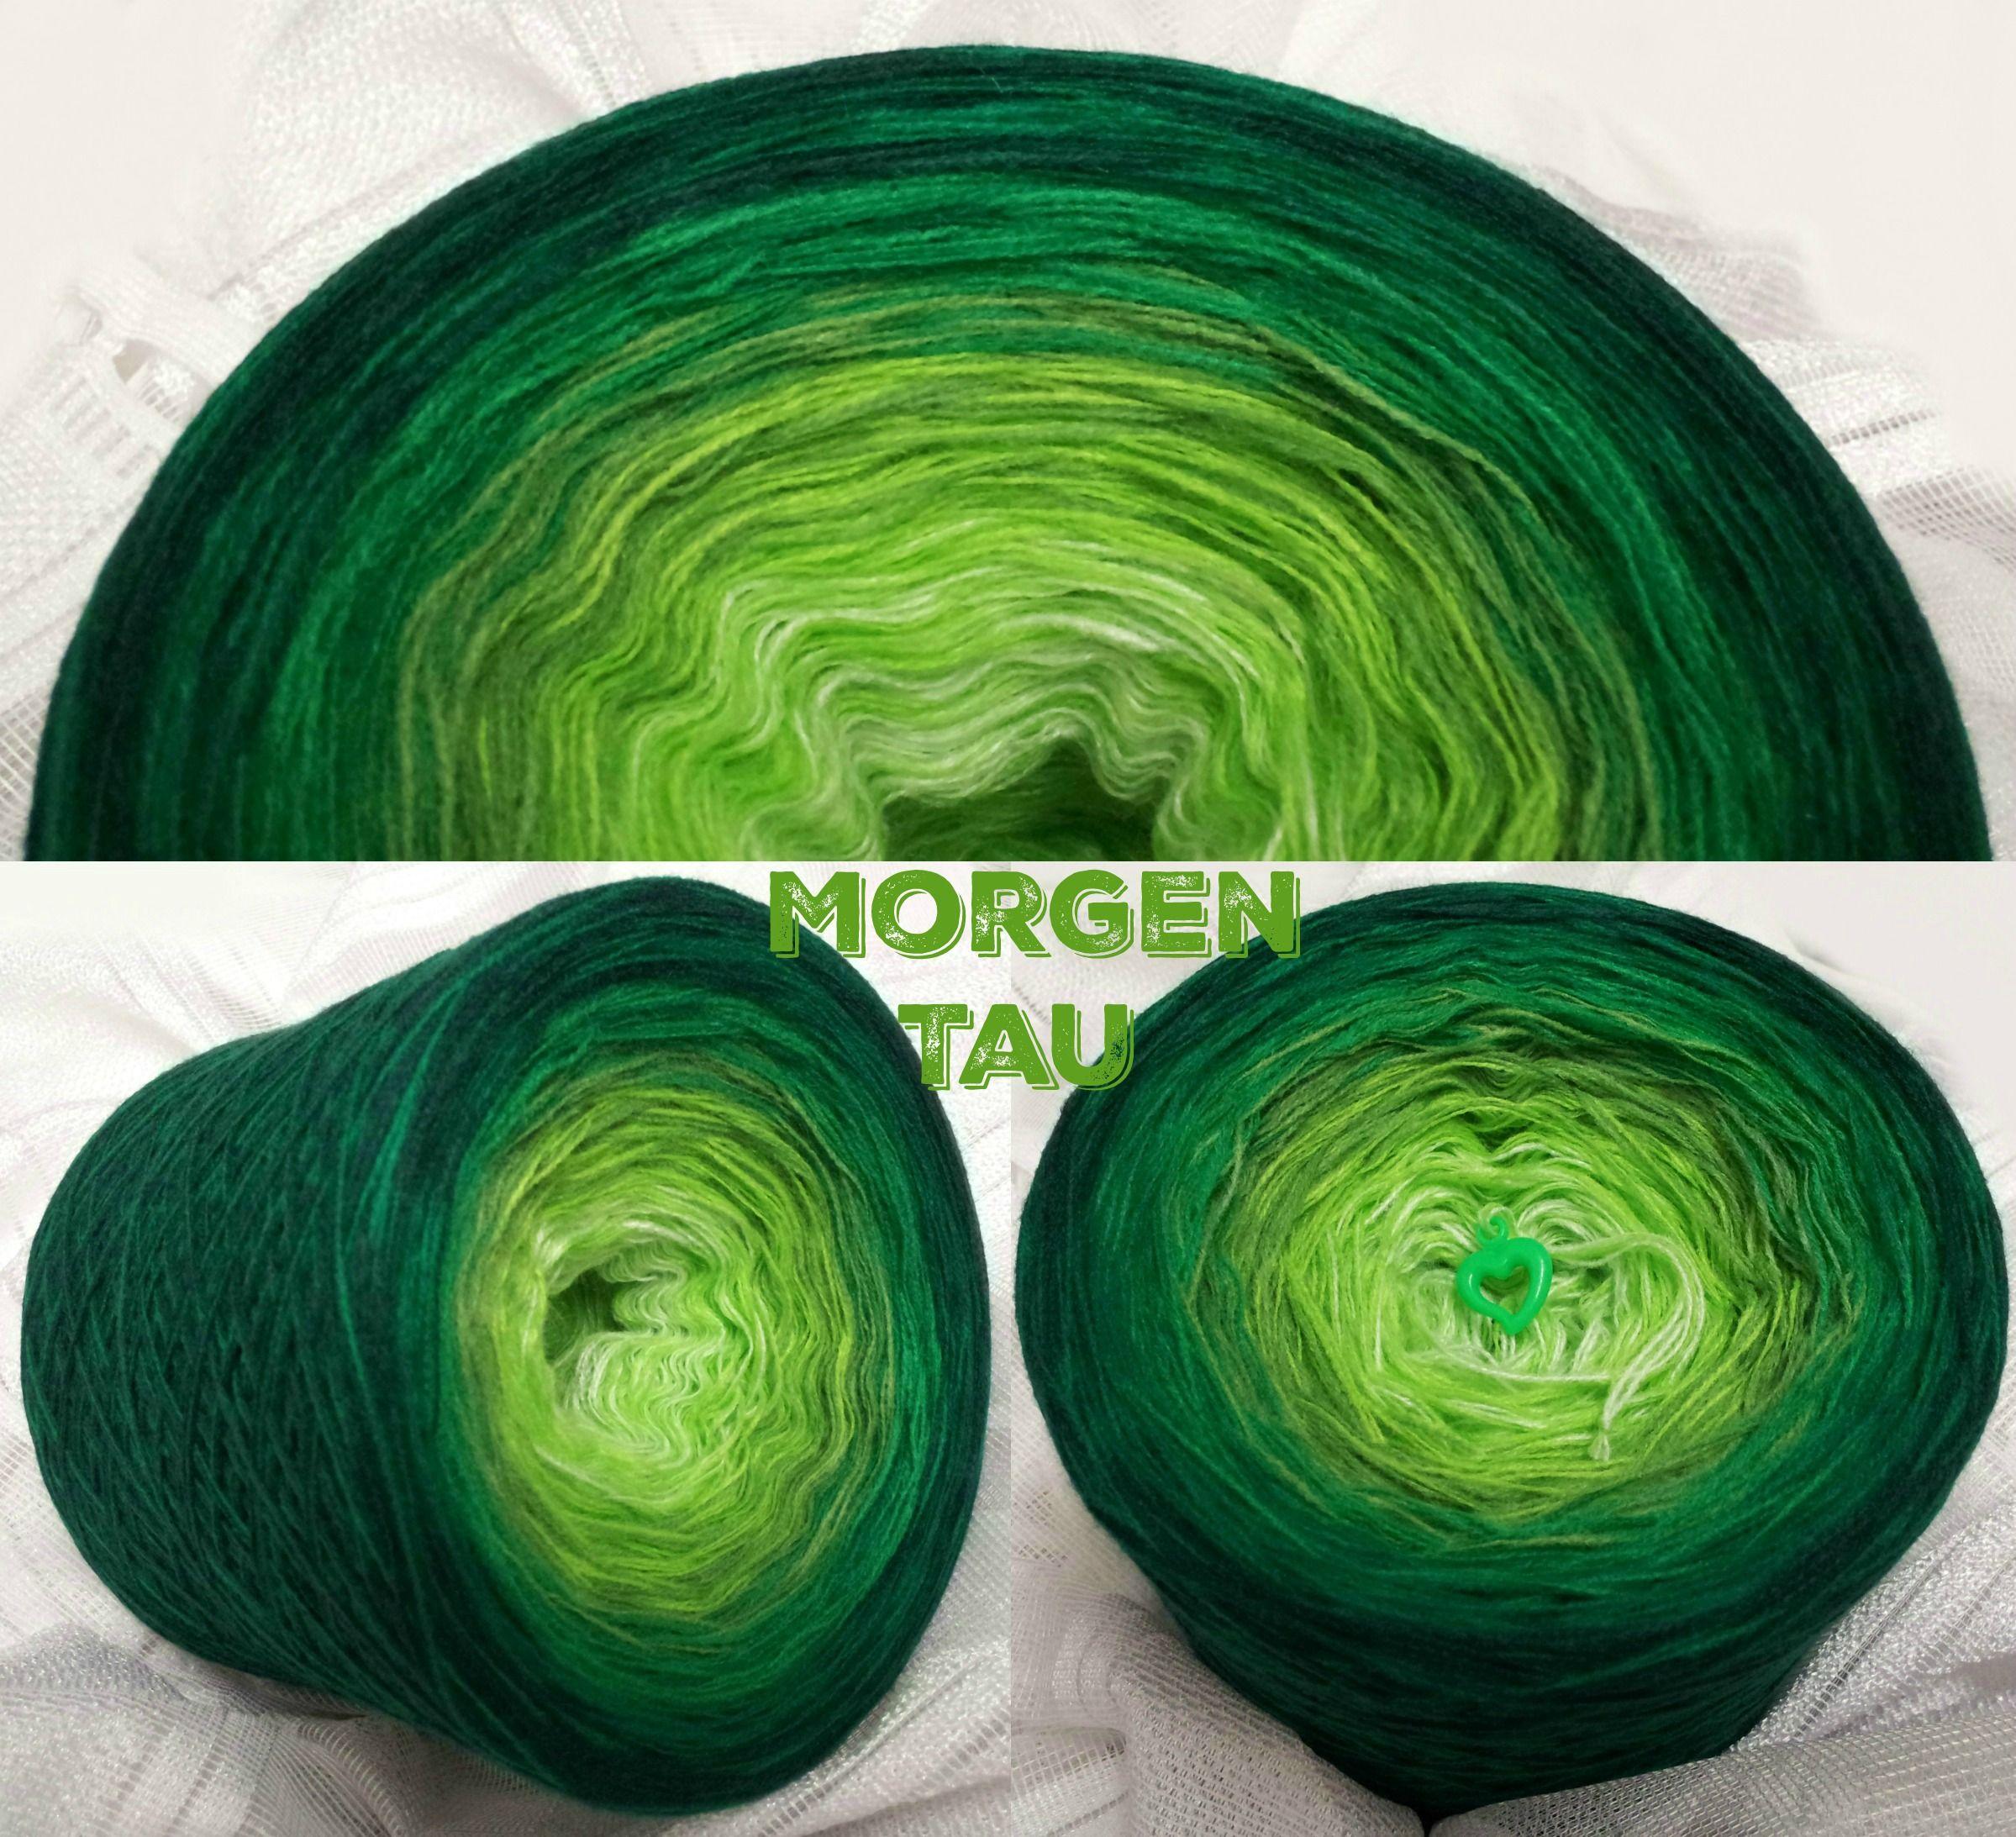 Morgentau: Hochbauschacryl 3 fädig 6 Farben: lindgrün apfelgrün ...